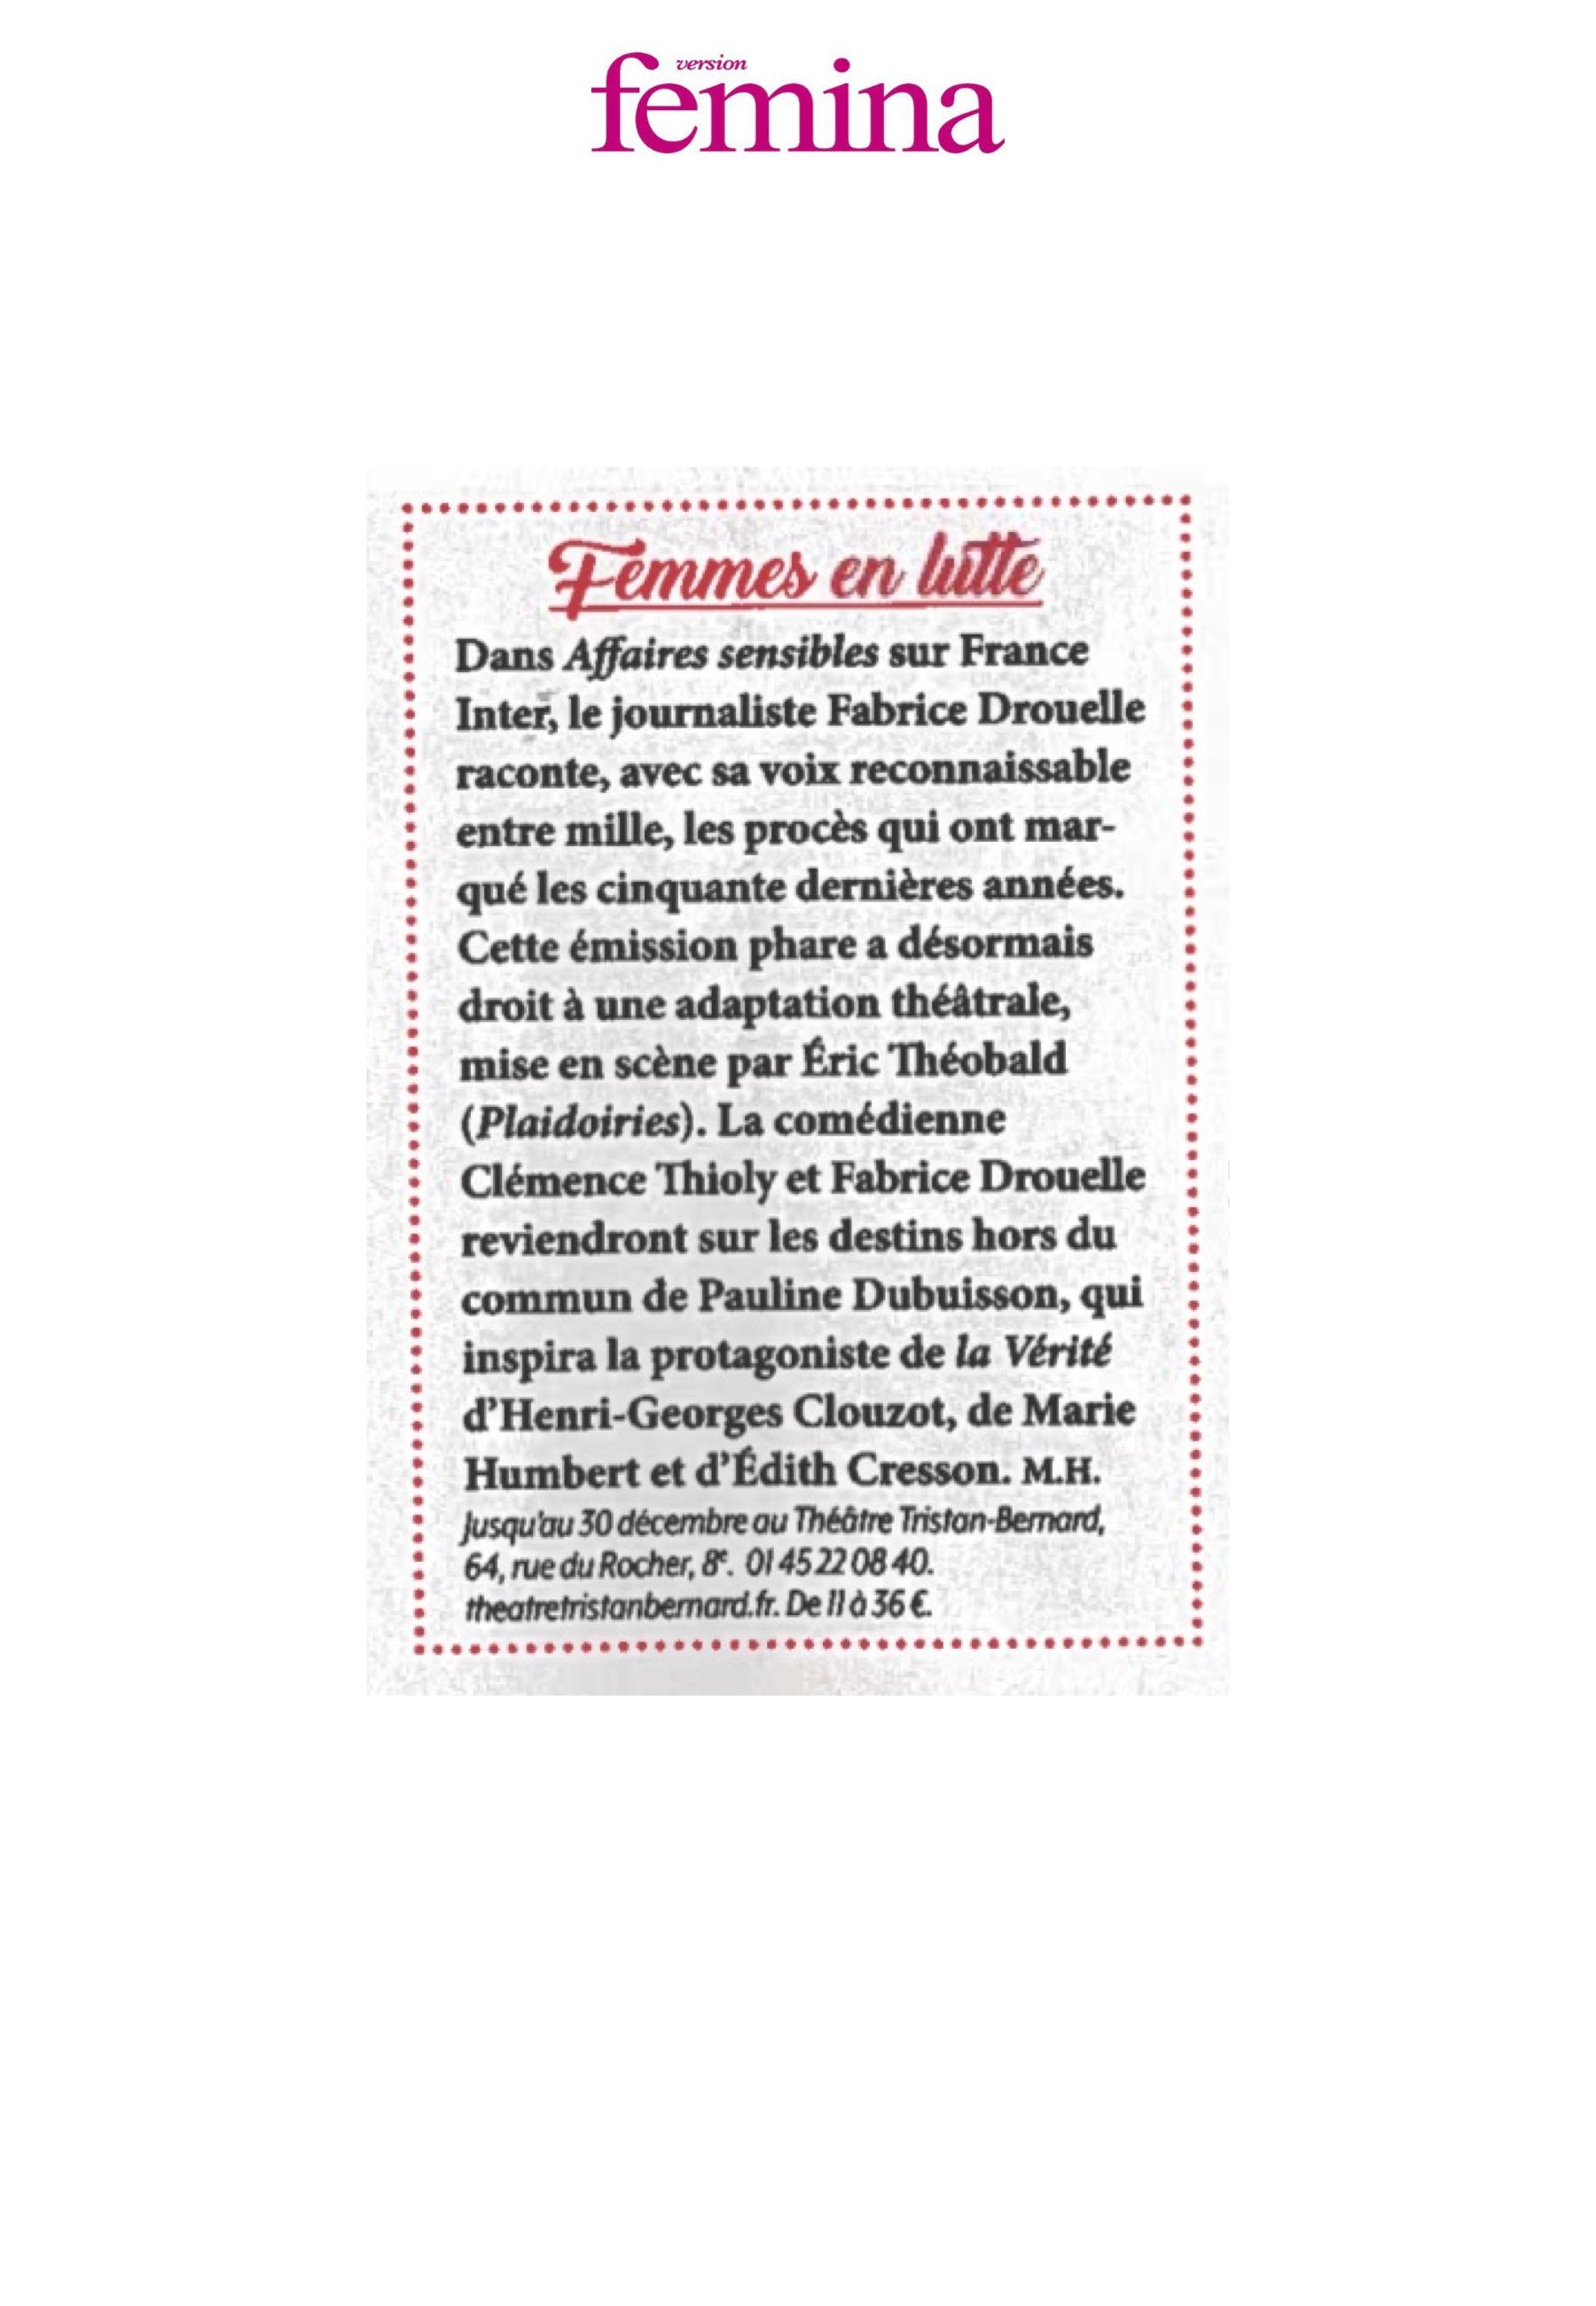 VERSION FEMINA 19.09.20